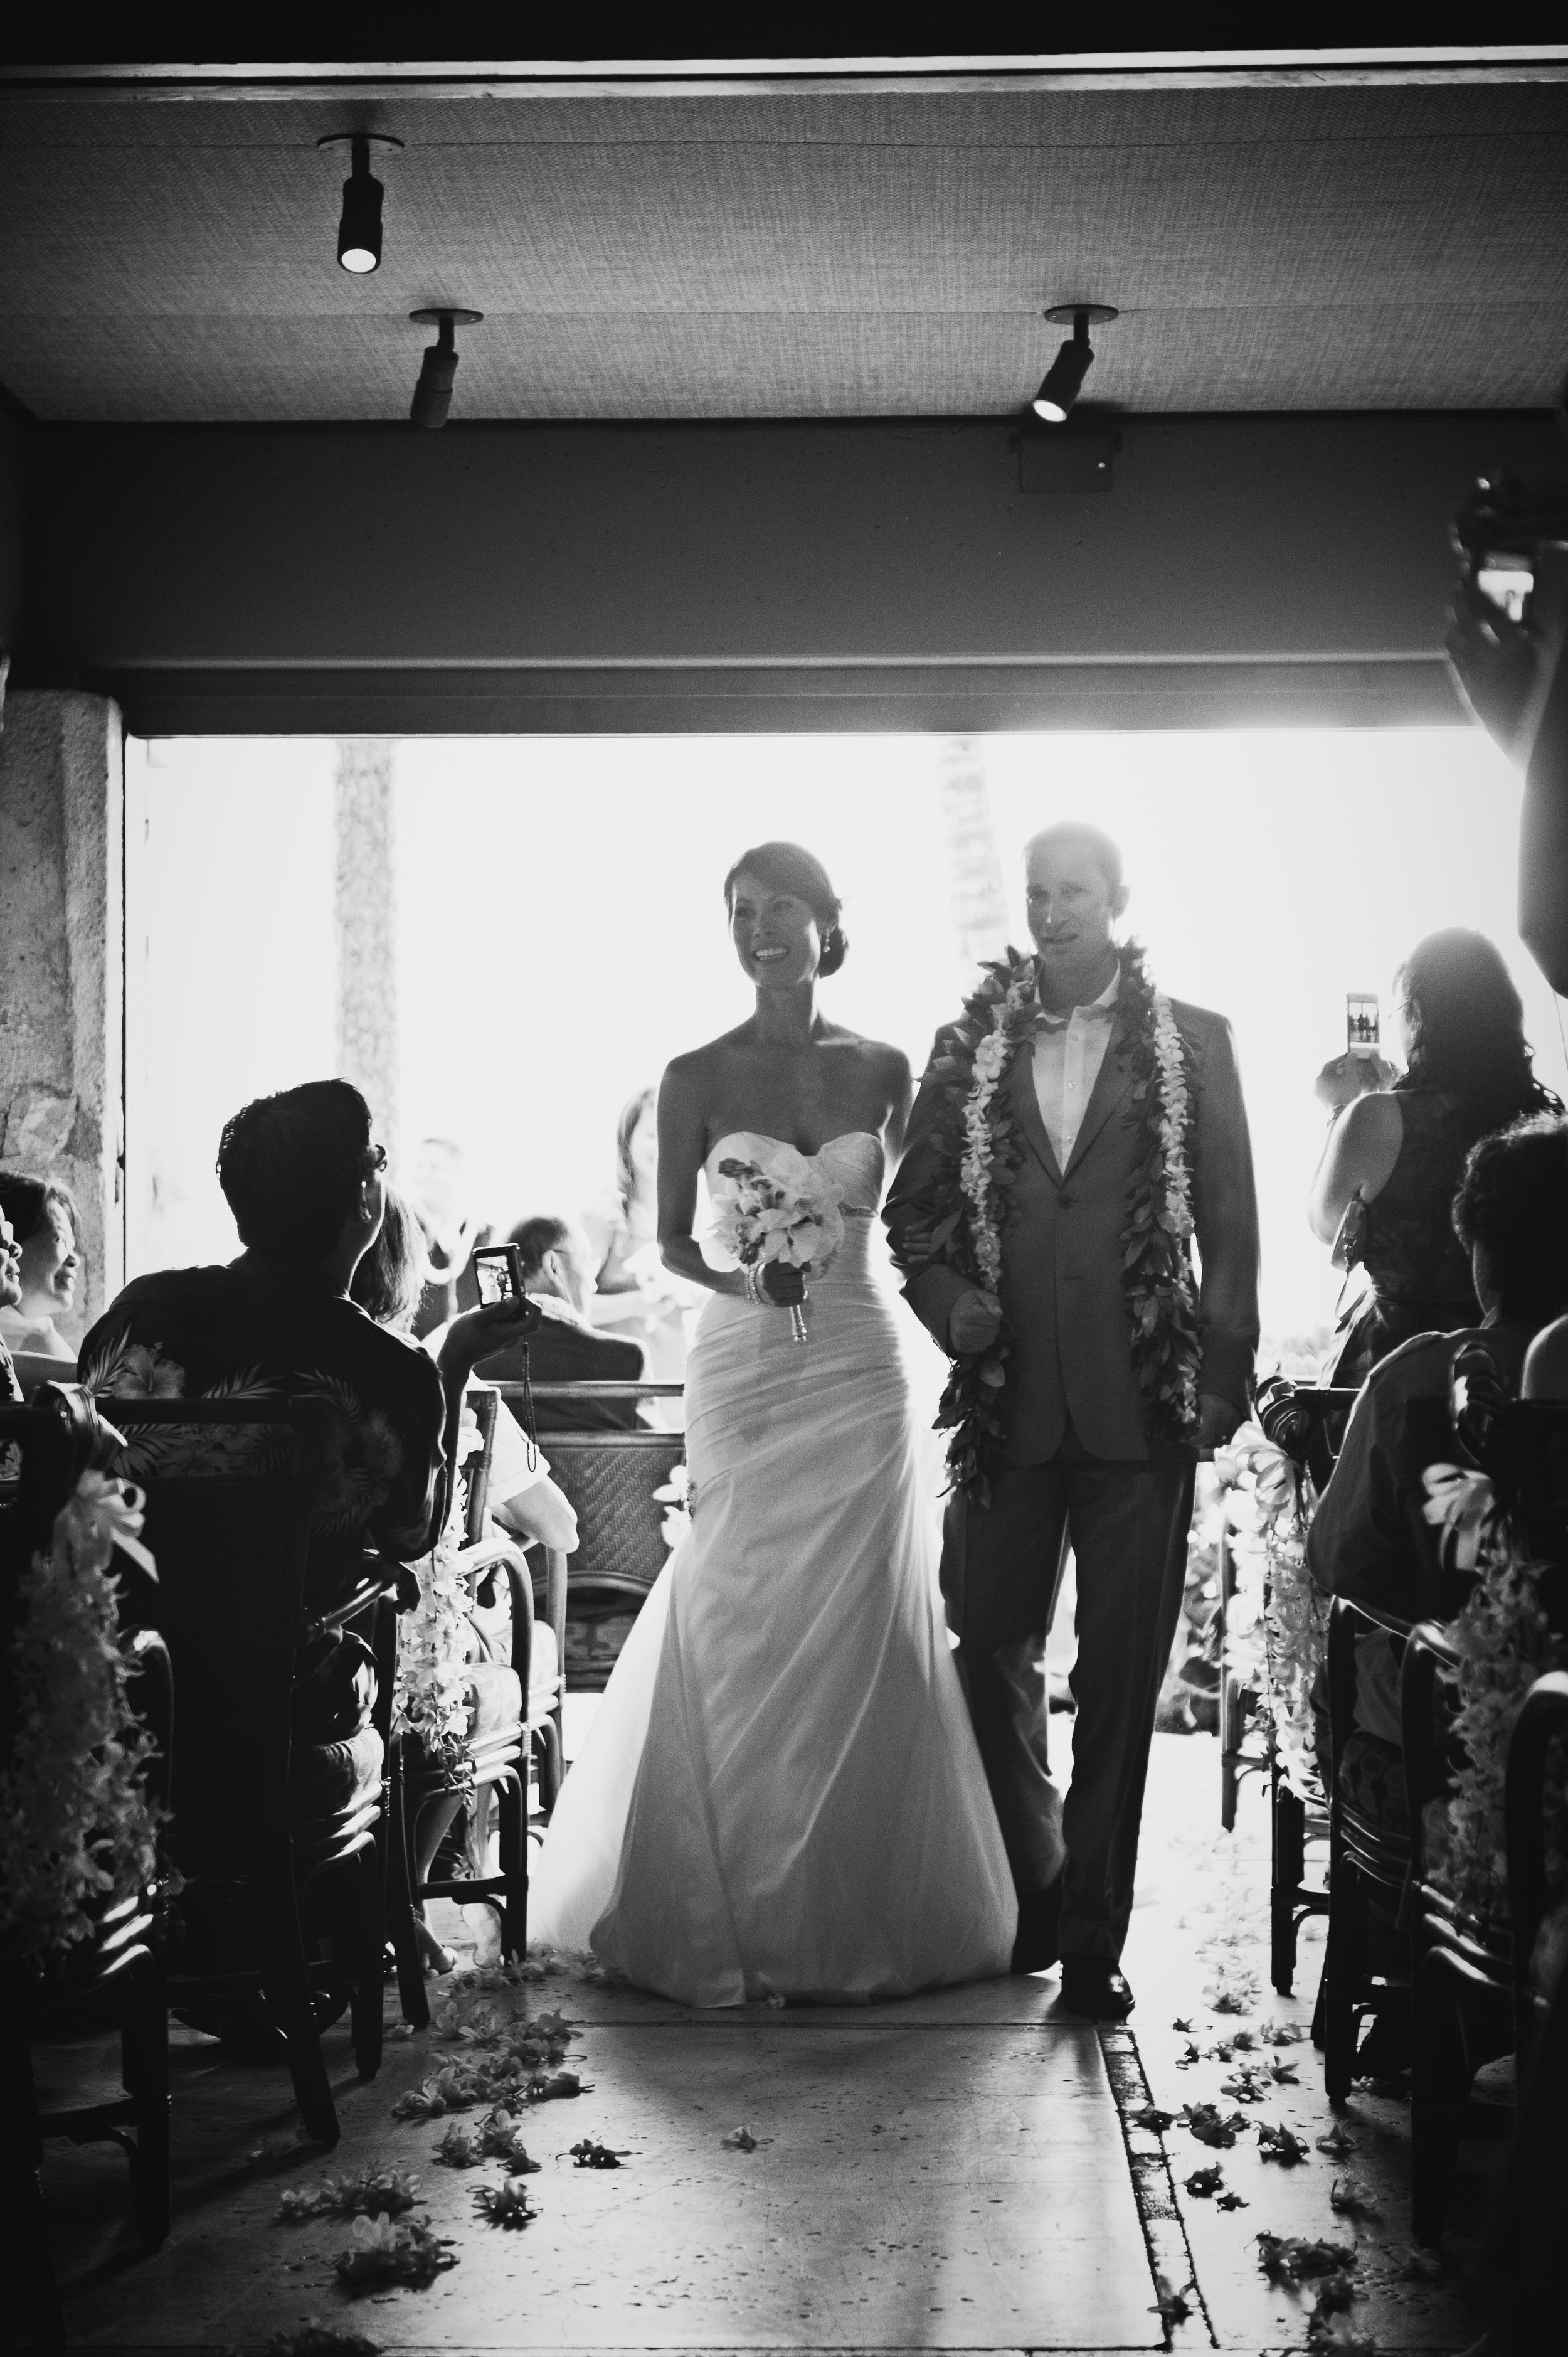 seattle-wedding-photographer-9-2.jpg